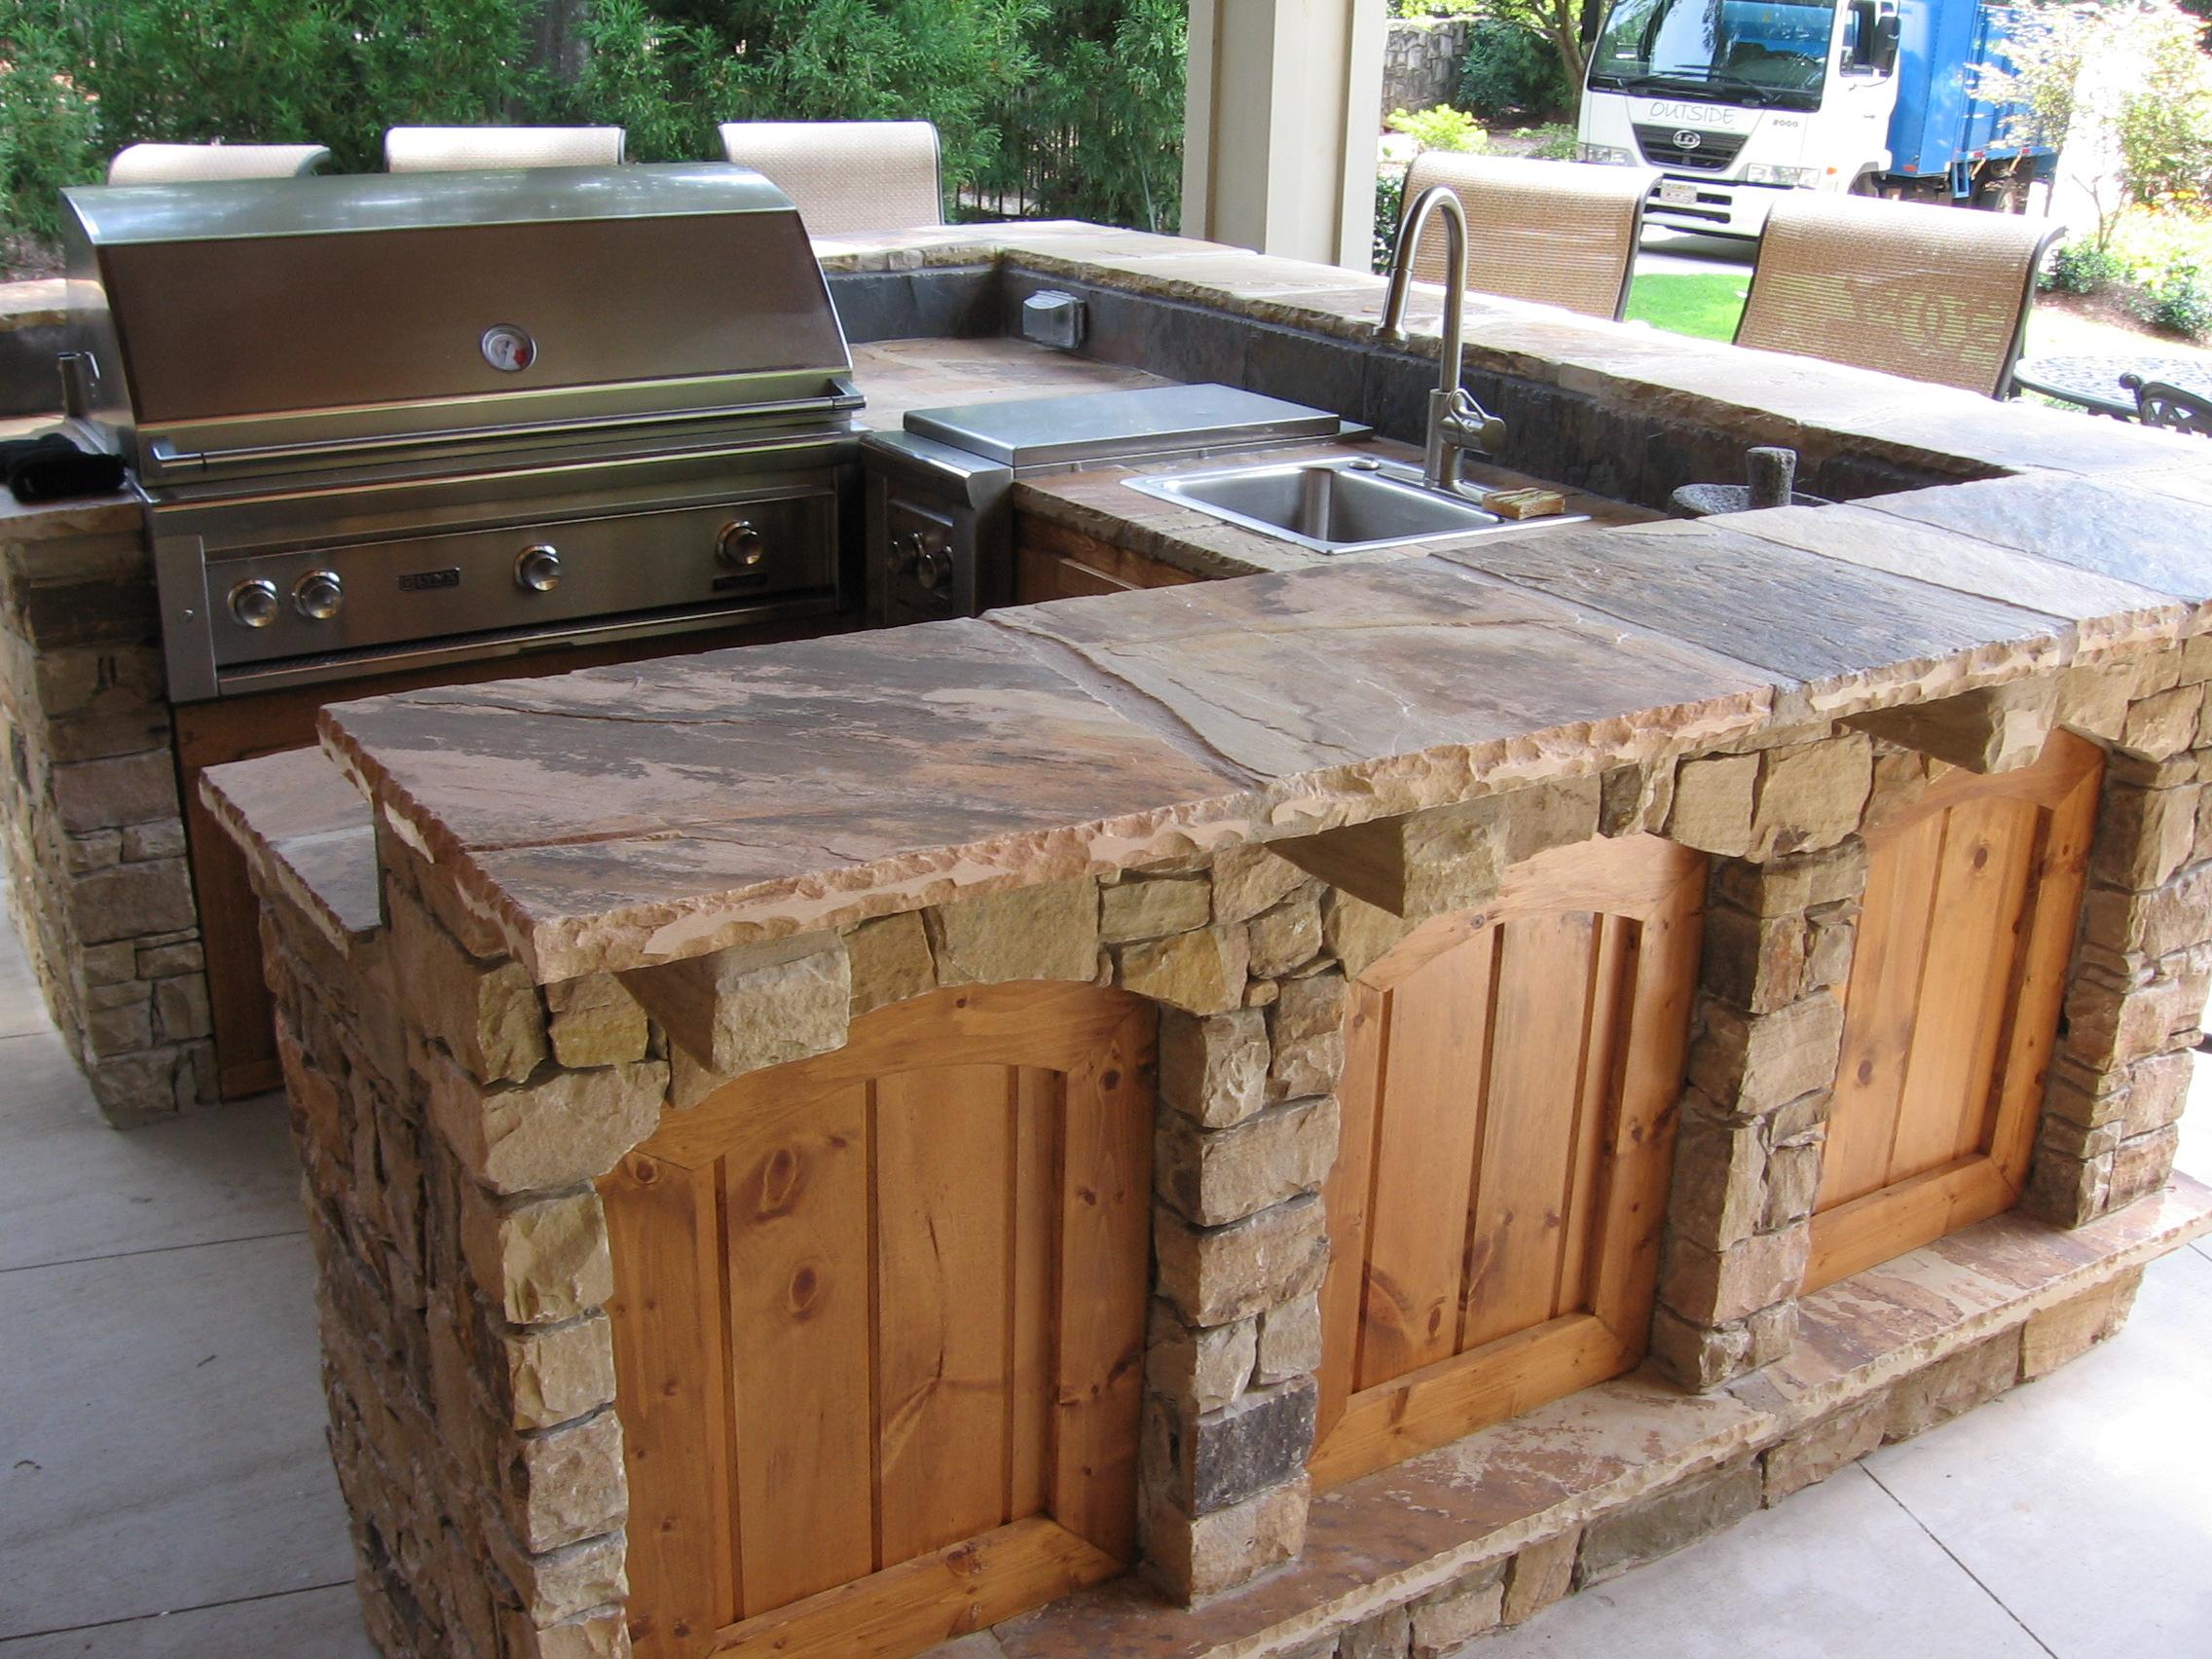 Outdoor Kitchen Design And Construction Alpharetta Atlanta Ga Outside Landscape Group Llc